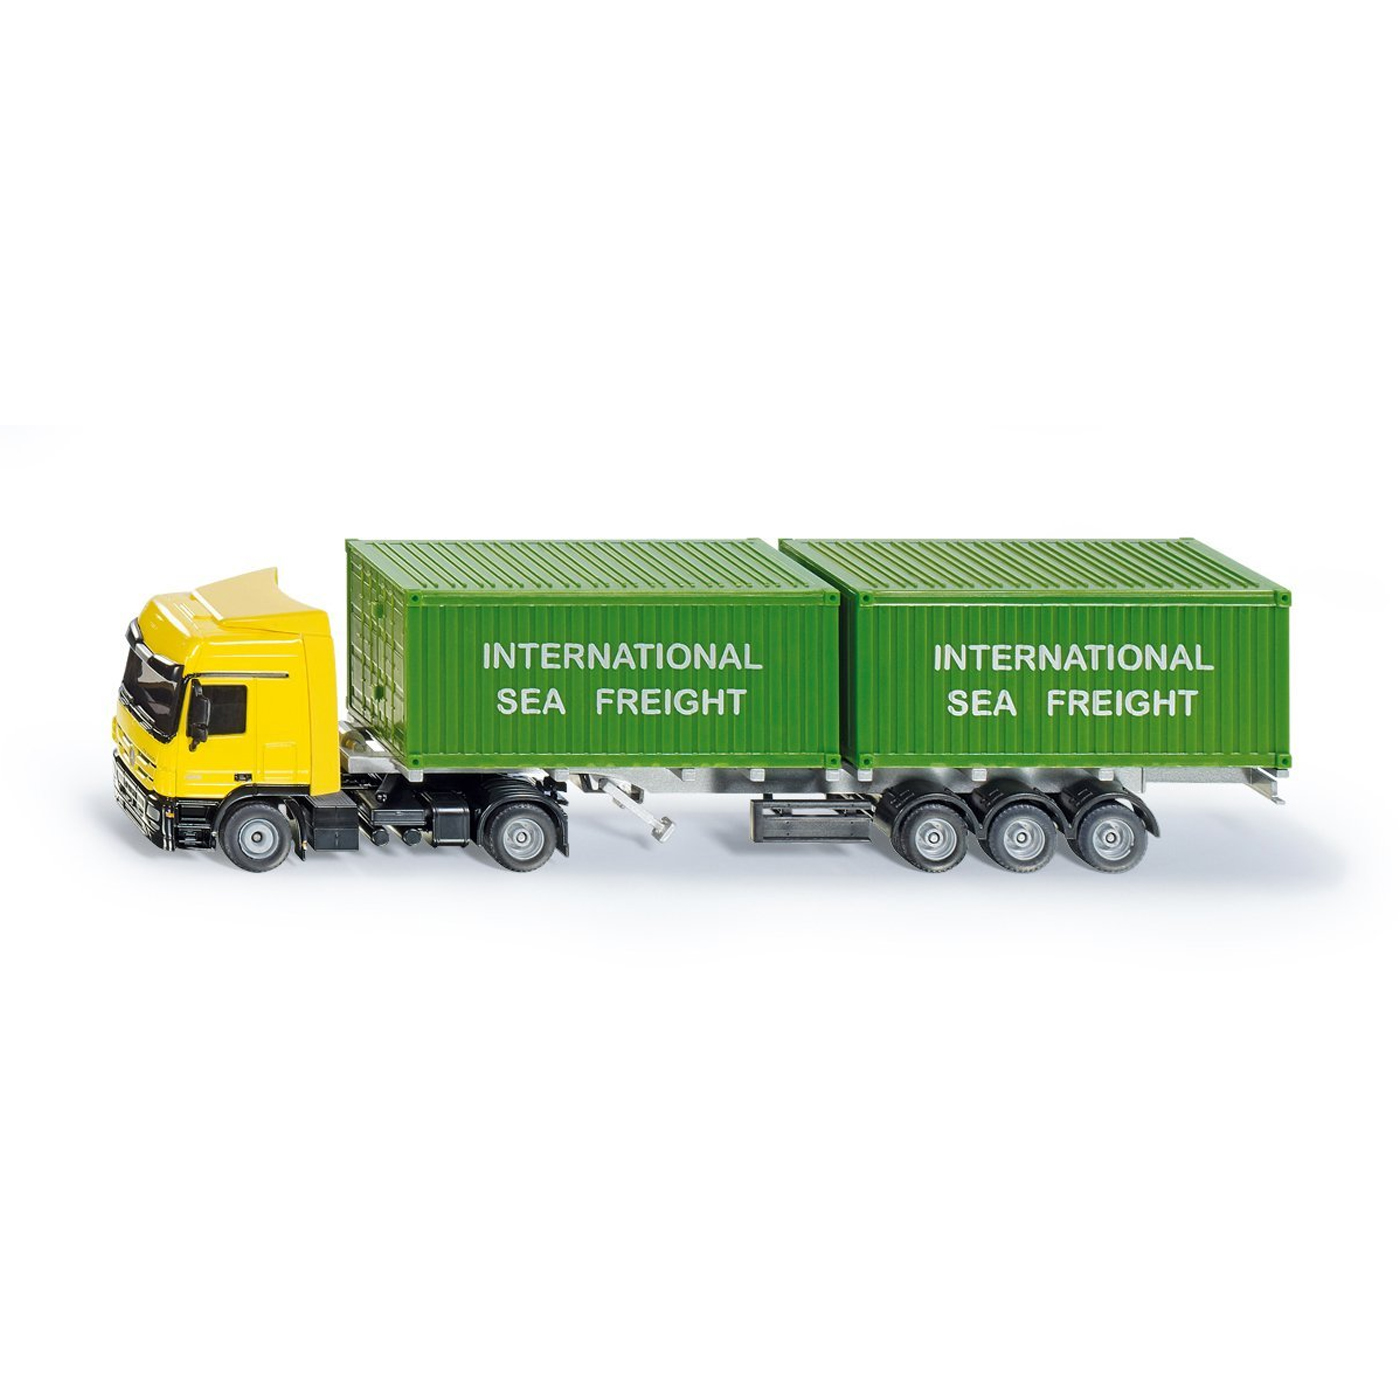 Грузовик с контейнерами, 1:50Грузовики/самосвалы<br>Грузовик с контейнерами, 1:50<br>